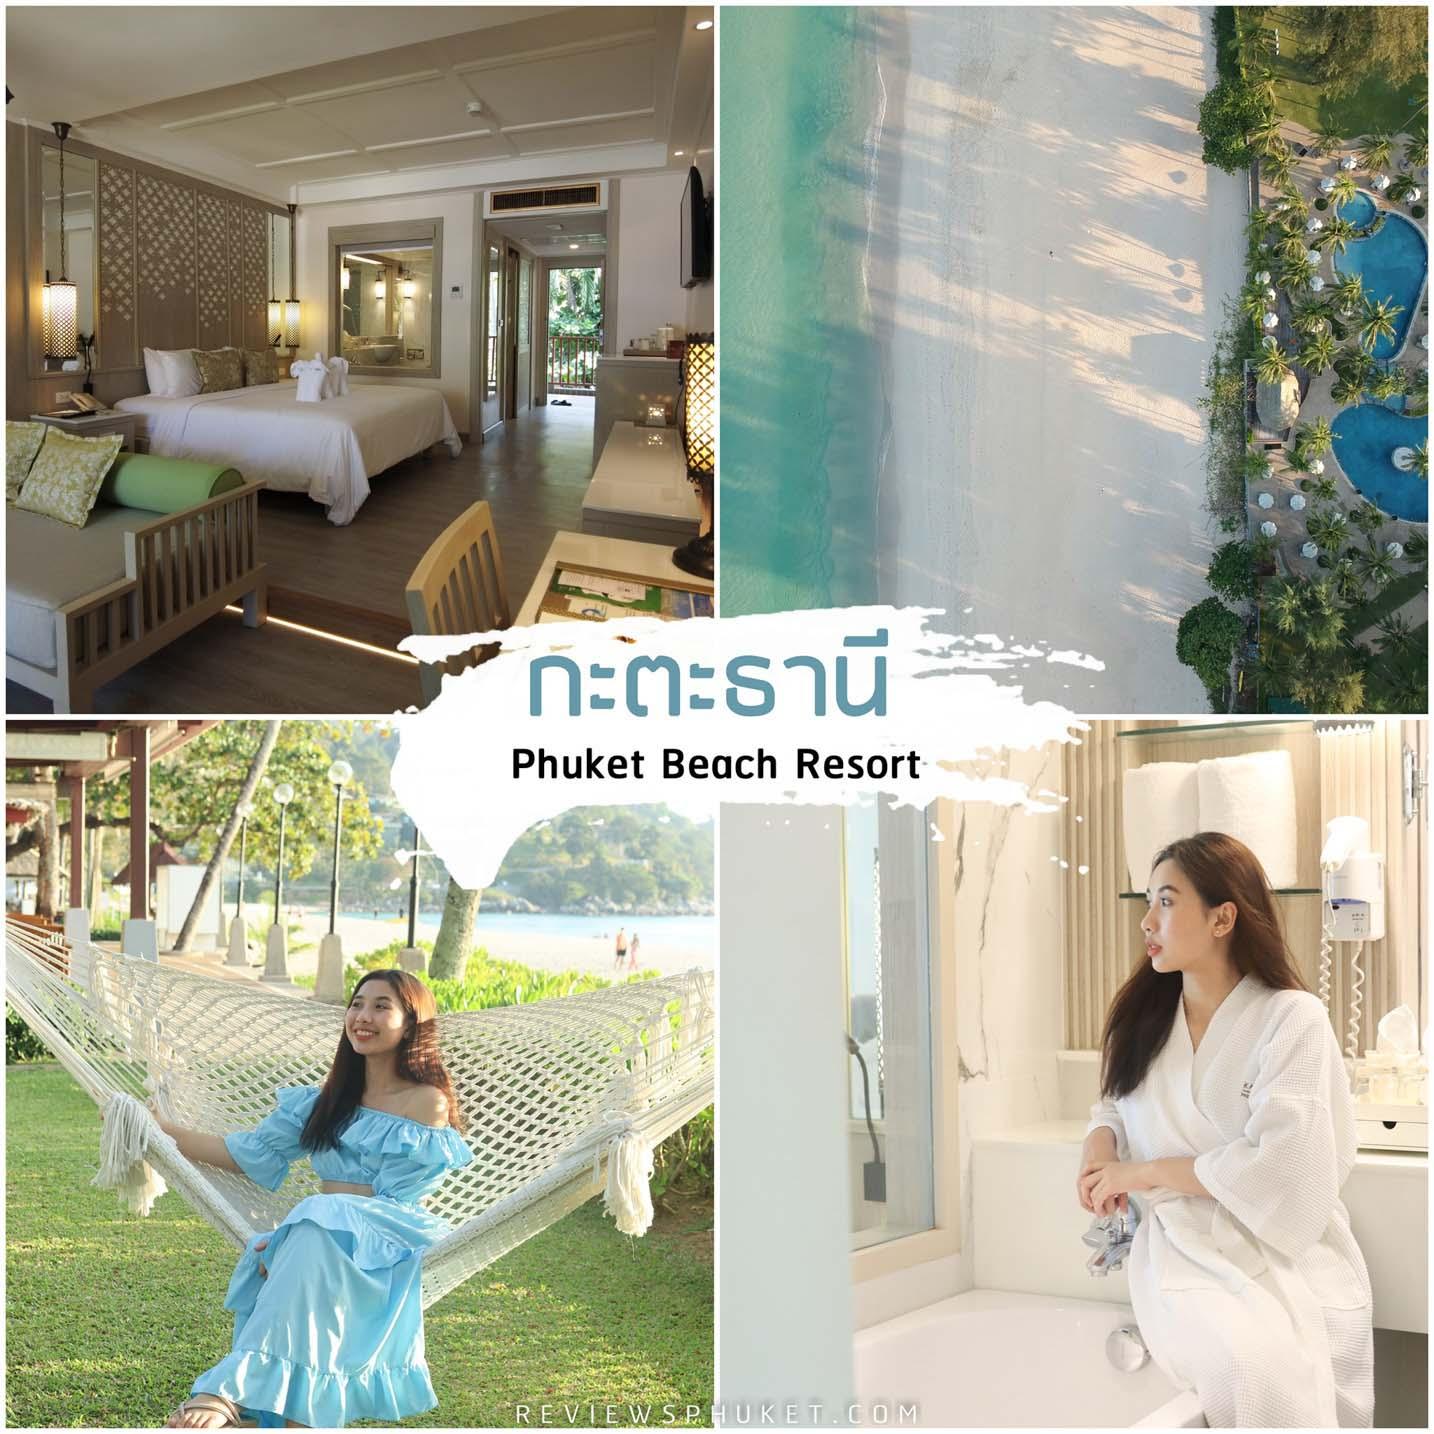 Kata Thani Phuket Beach resort  ที่พักภูเก็ตสุดสวยริมทะเลหาดกะตะ หาดสวยน้ำใสมวาก